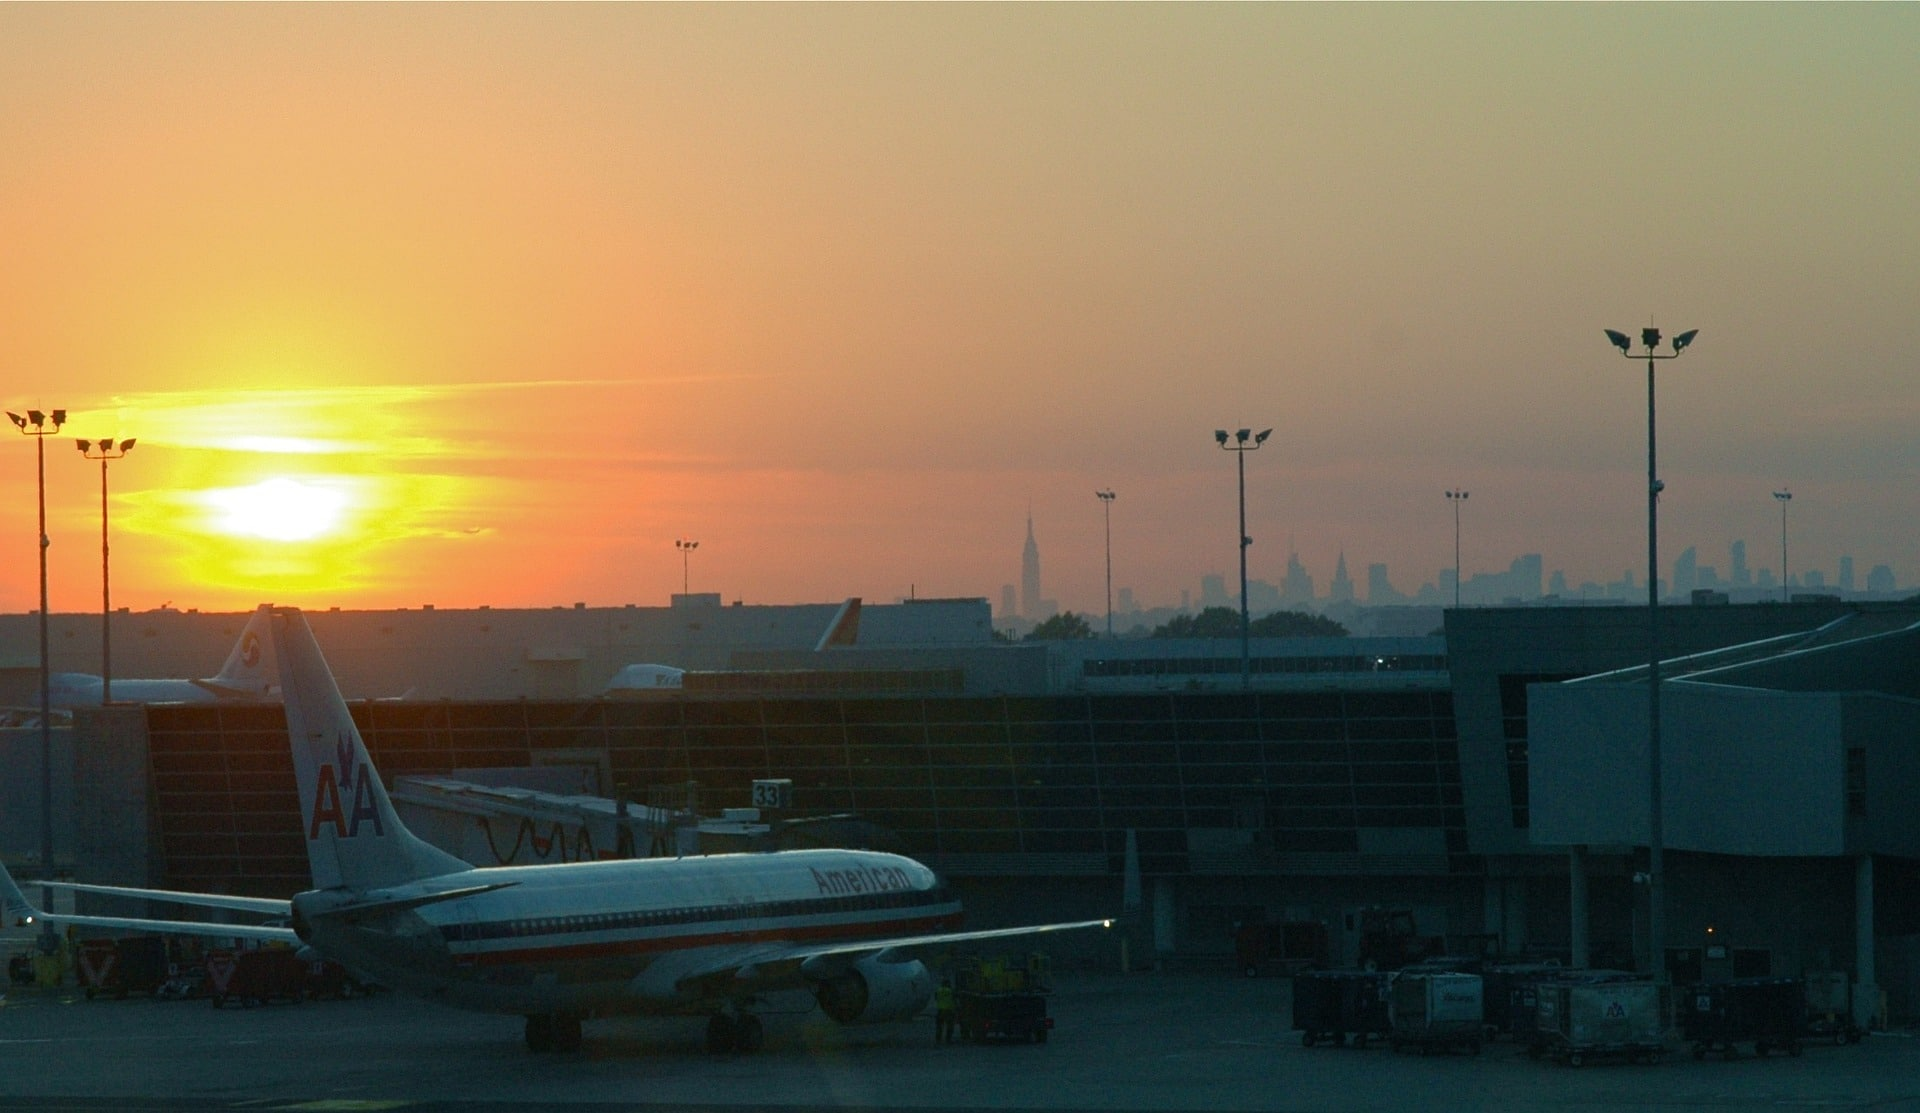 Van Charter Services NYC Major Airports LGA, JFK, EWR